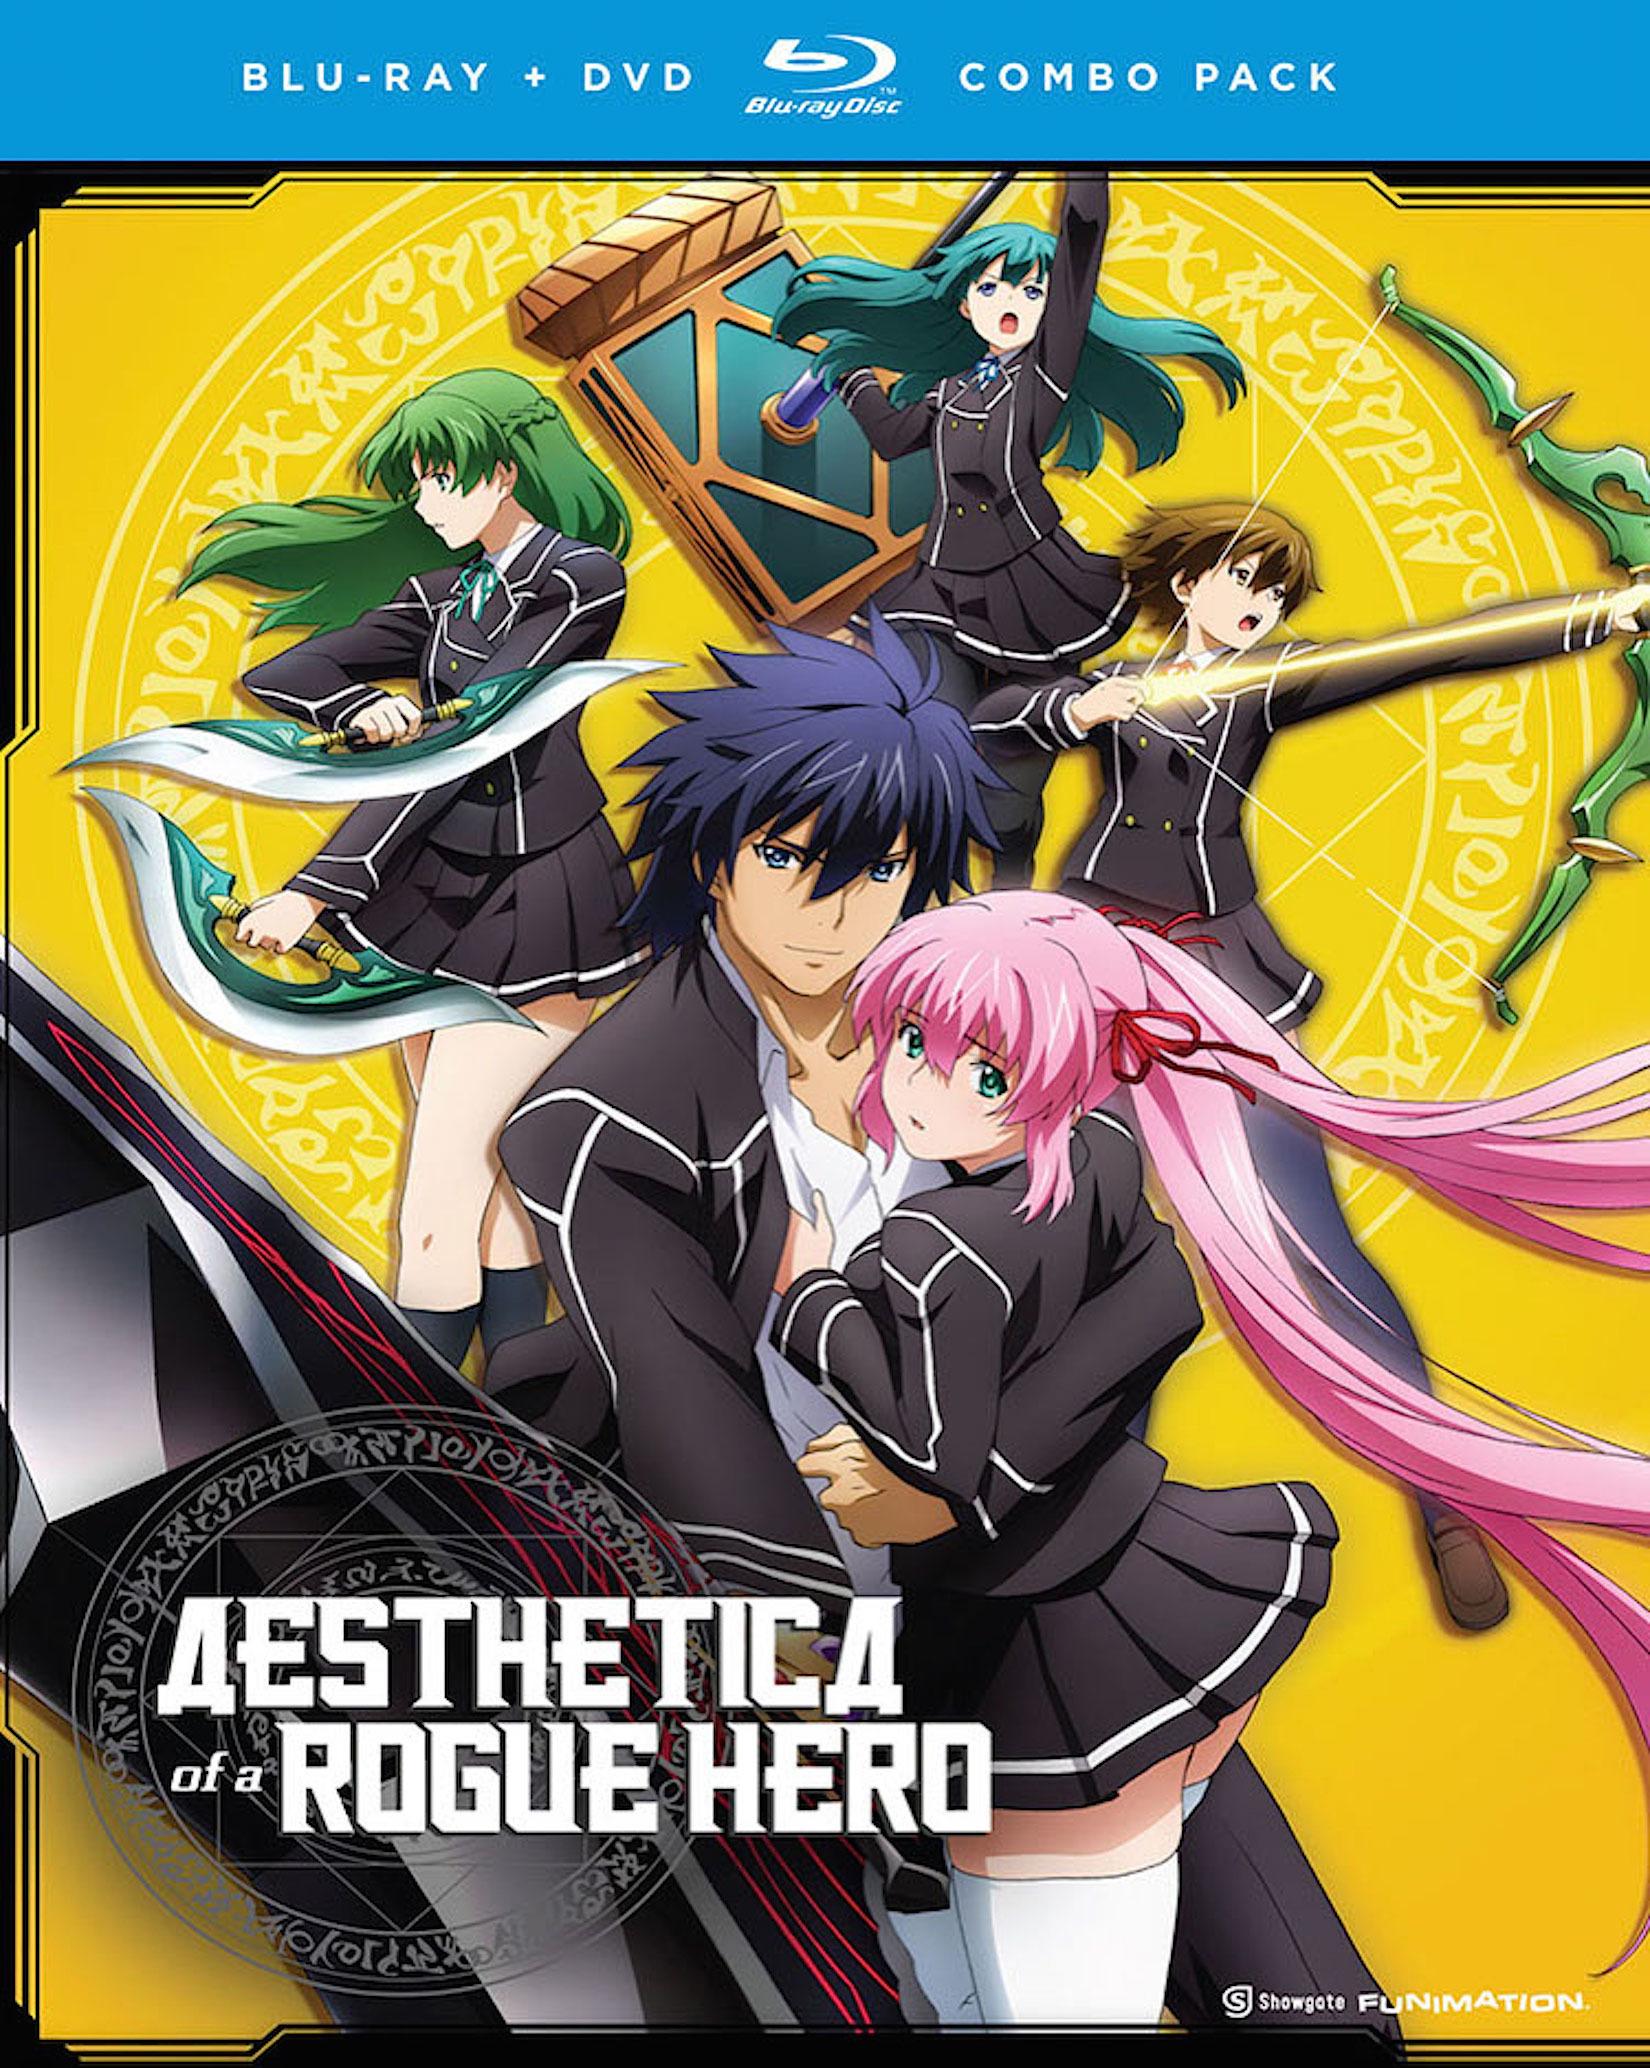 Aesthetica of a Rogue Hero